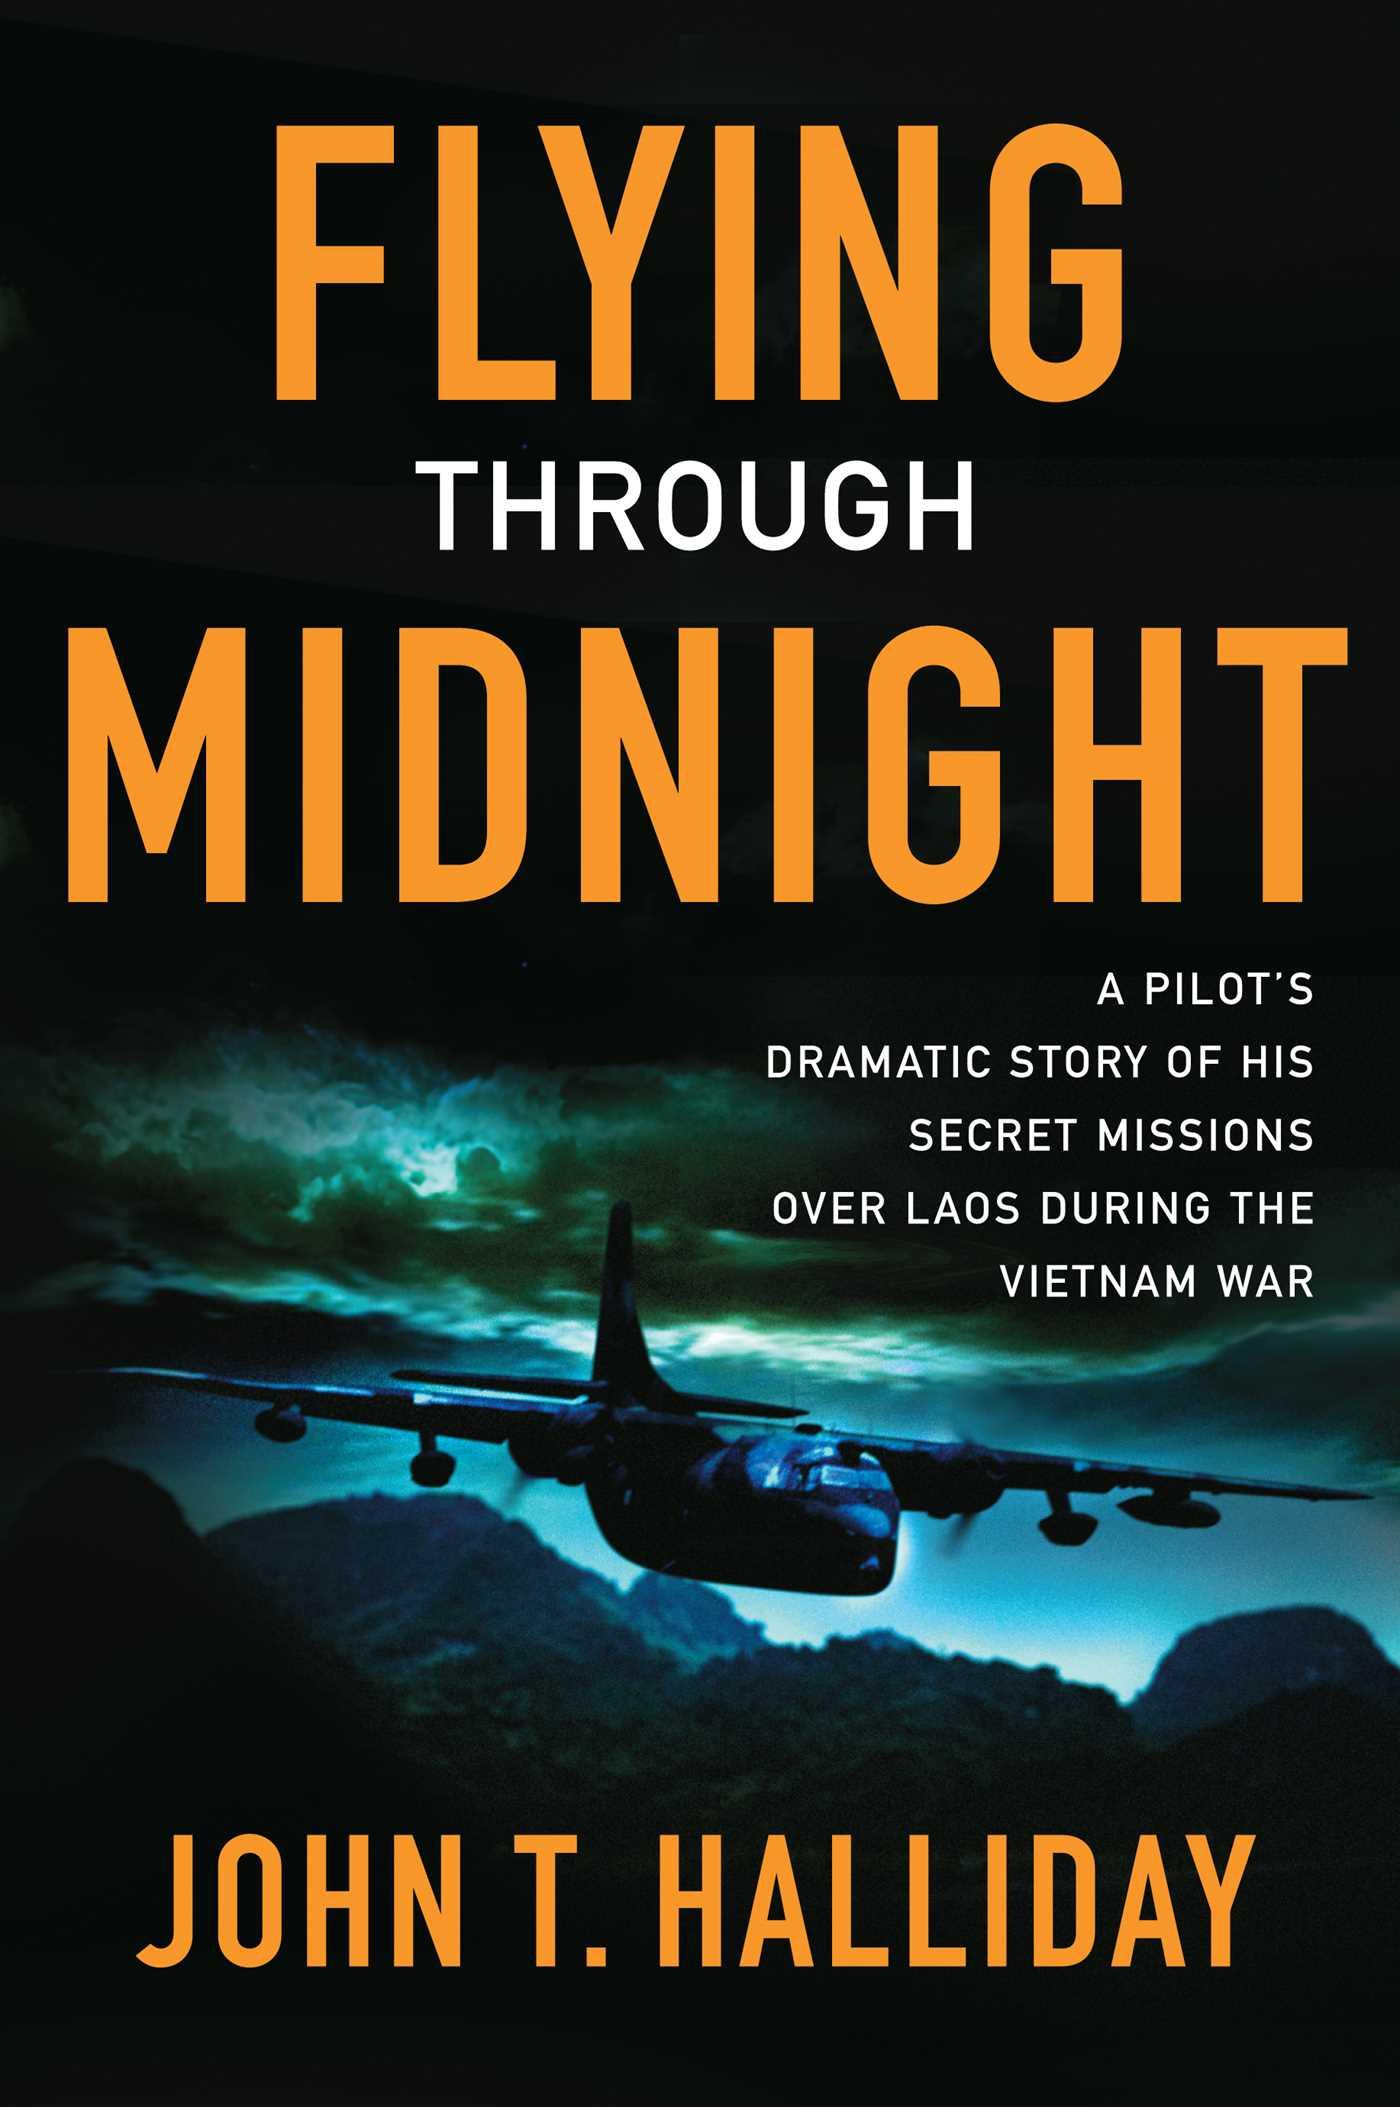 Flying through midnight 9780743281997 hr